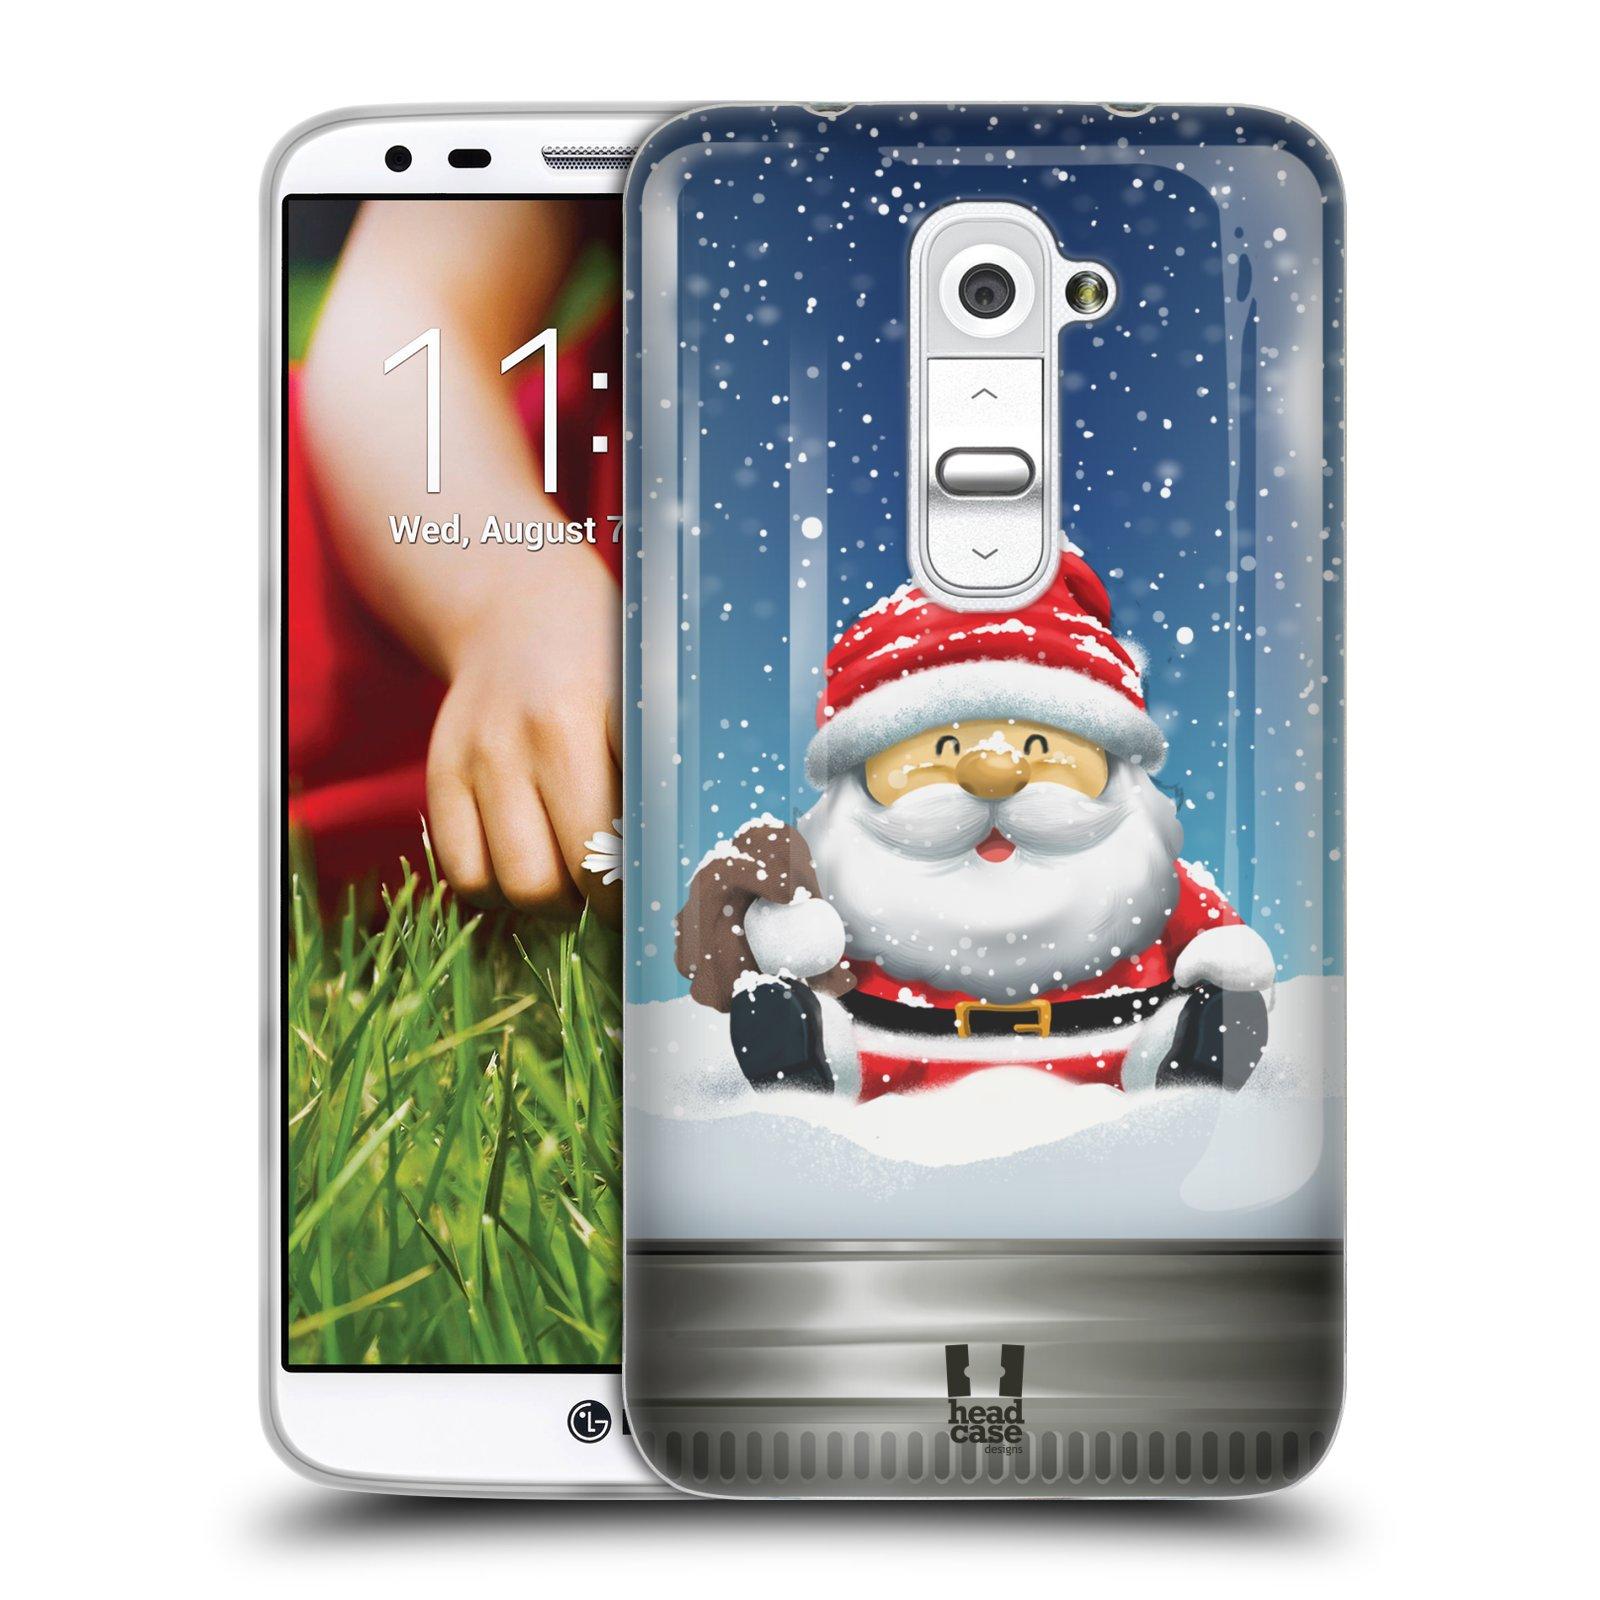 HEAD CASE CHRISTMAS IN JARS GEL BACK CASE COVER FOR LG G2 D802